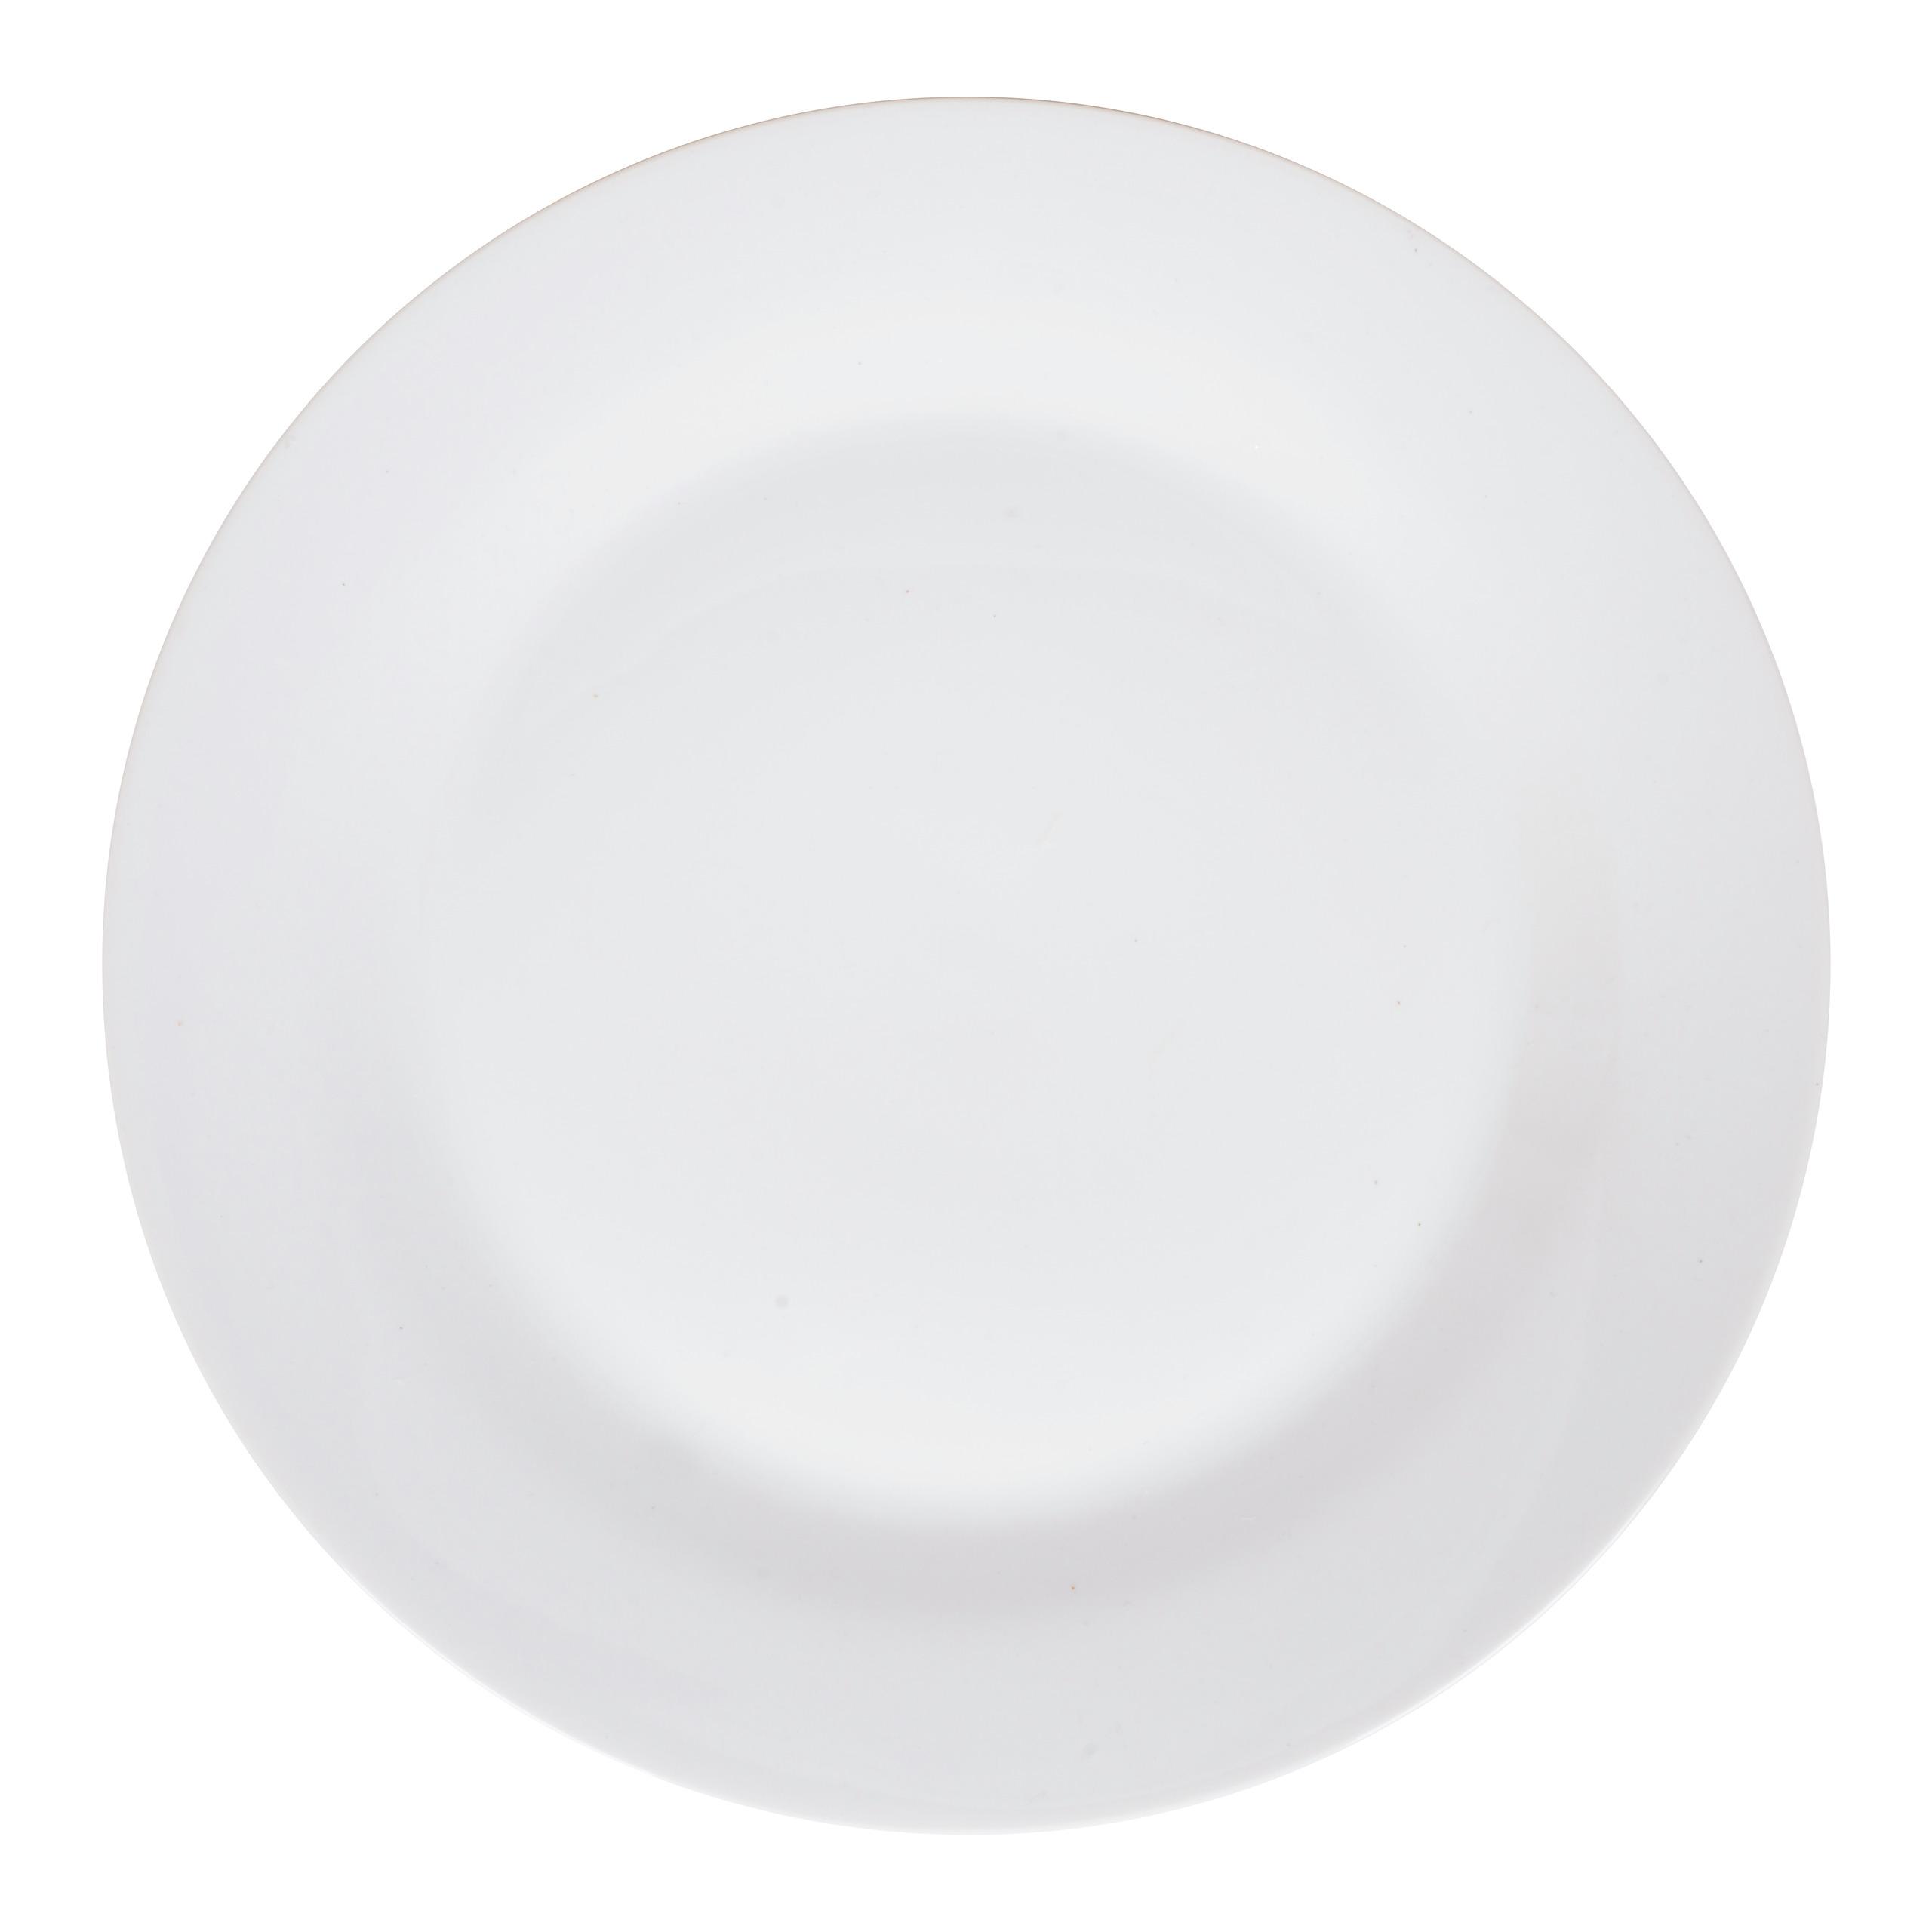 WHITE TALLERKEN Ø27CM-TAL105